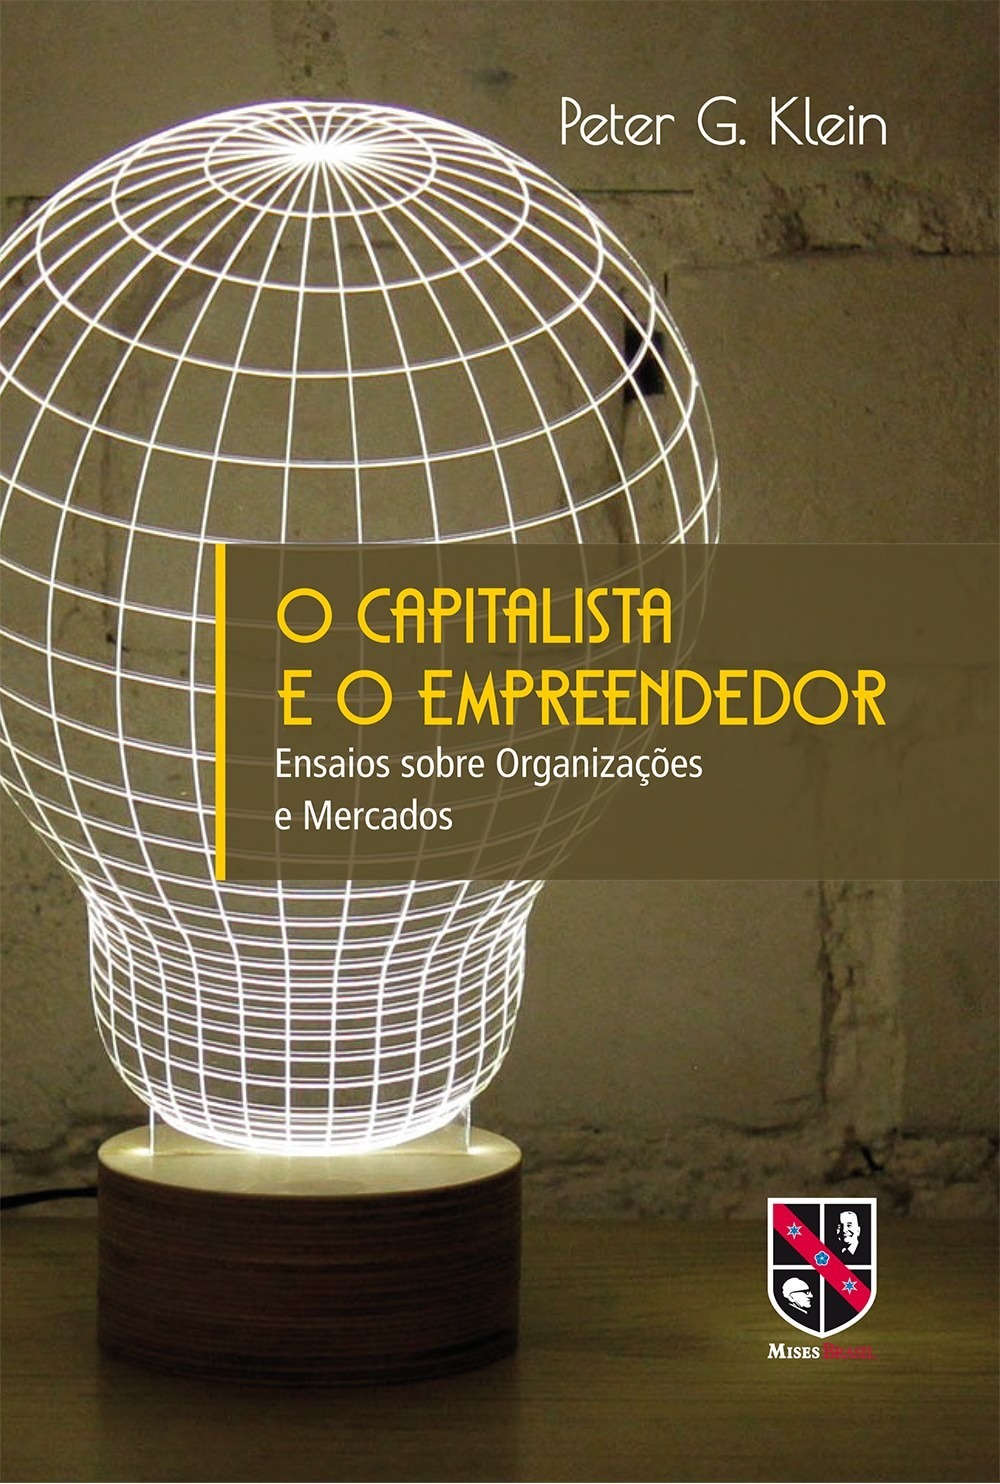 O Capitalista e o Empreendedor